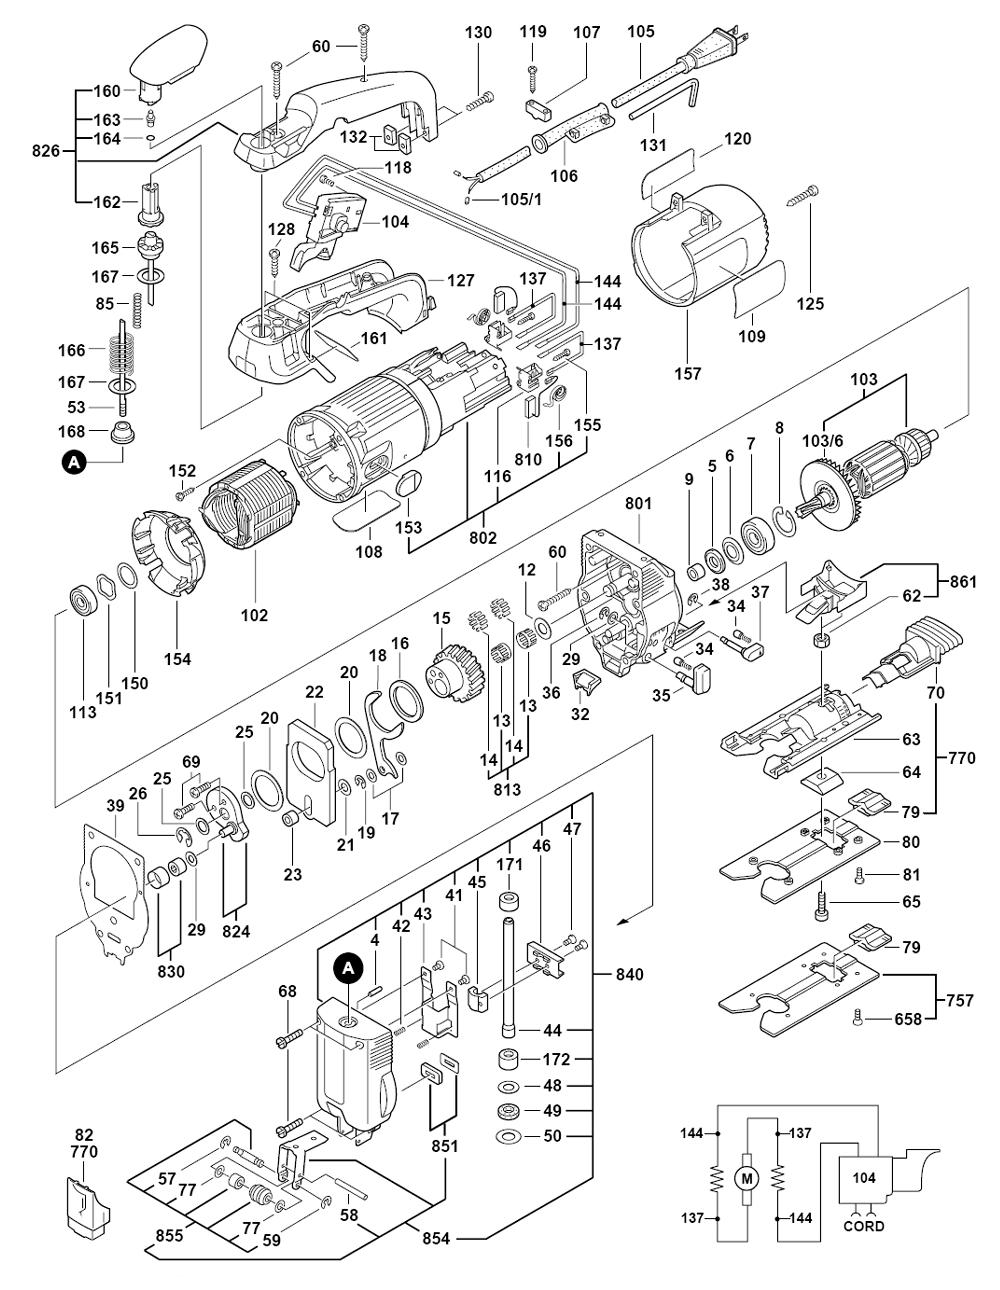 Buy Bosch 1587AVSK VS Orbital Jigsaw w/ Tool-Free Blade